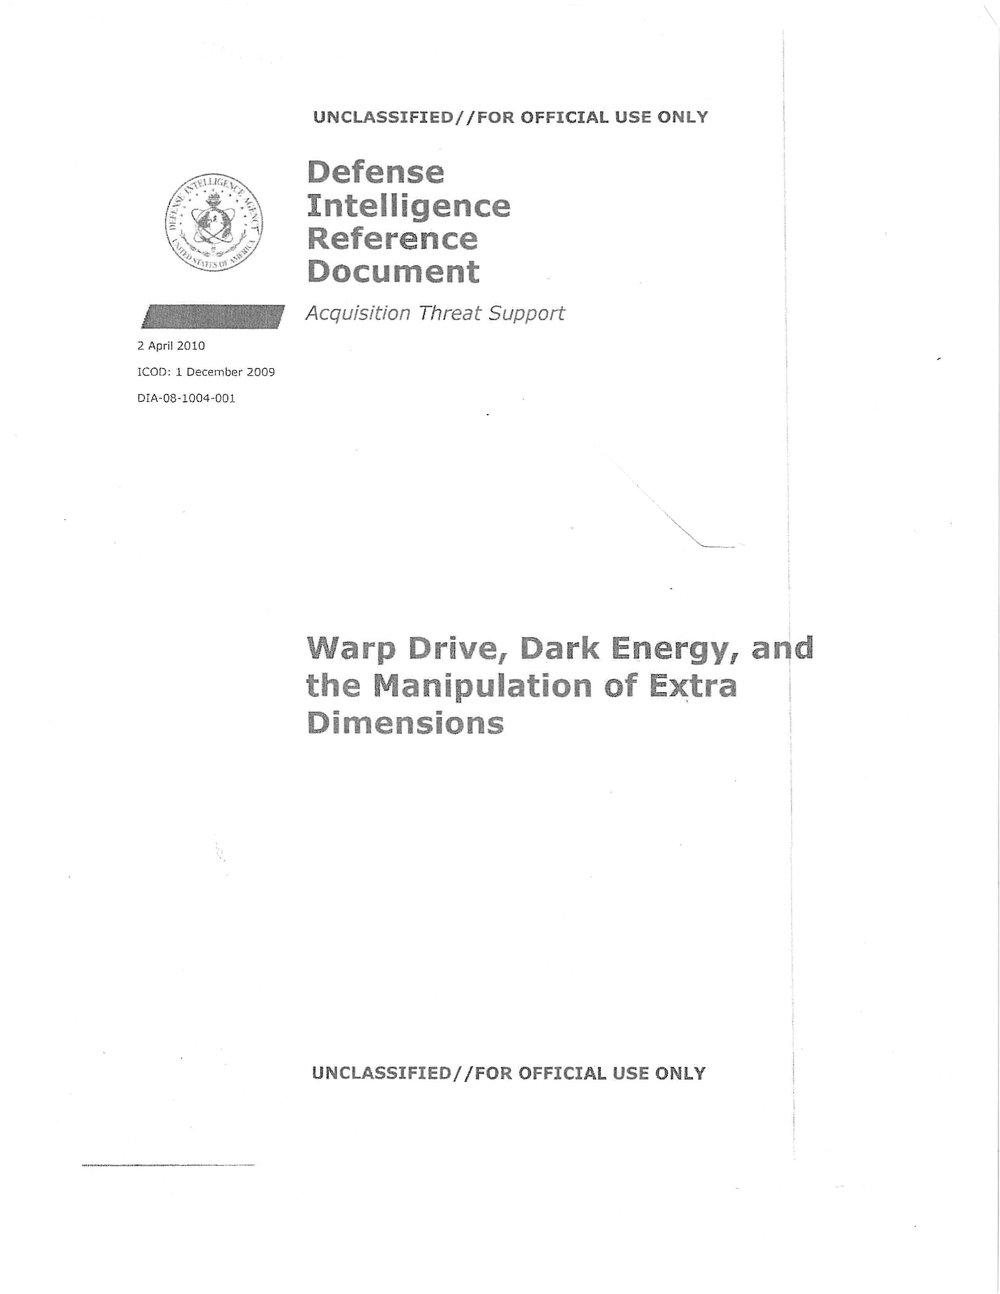 #19 - Warp Drive, Dark Energy & Dimensions